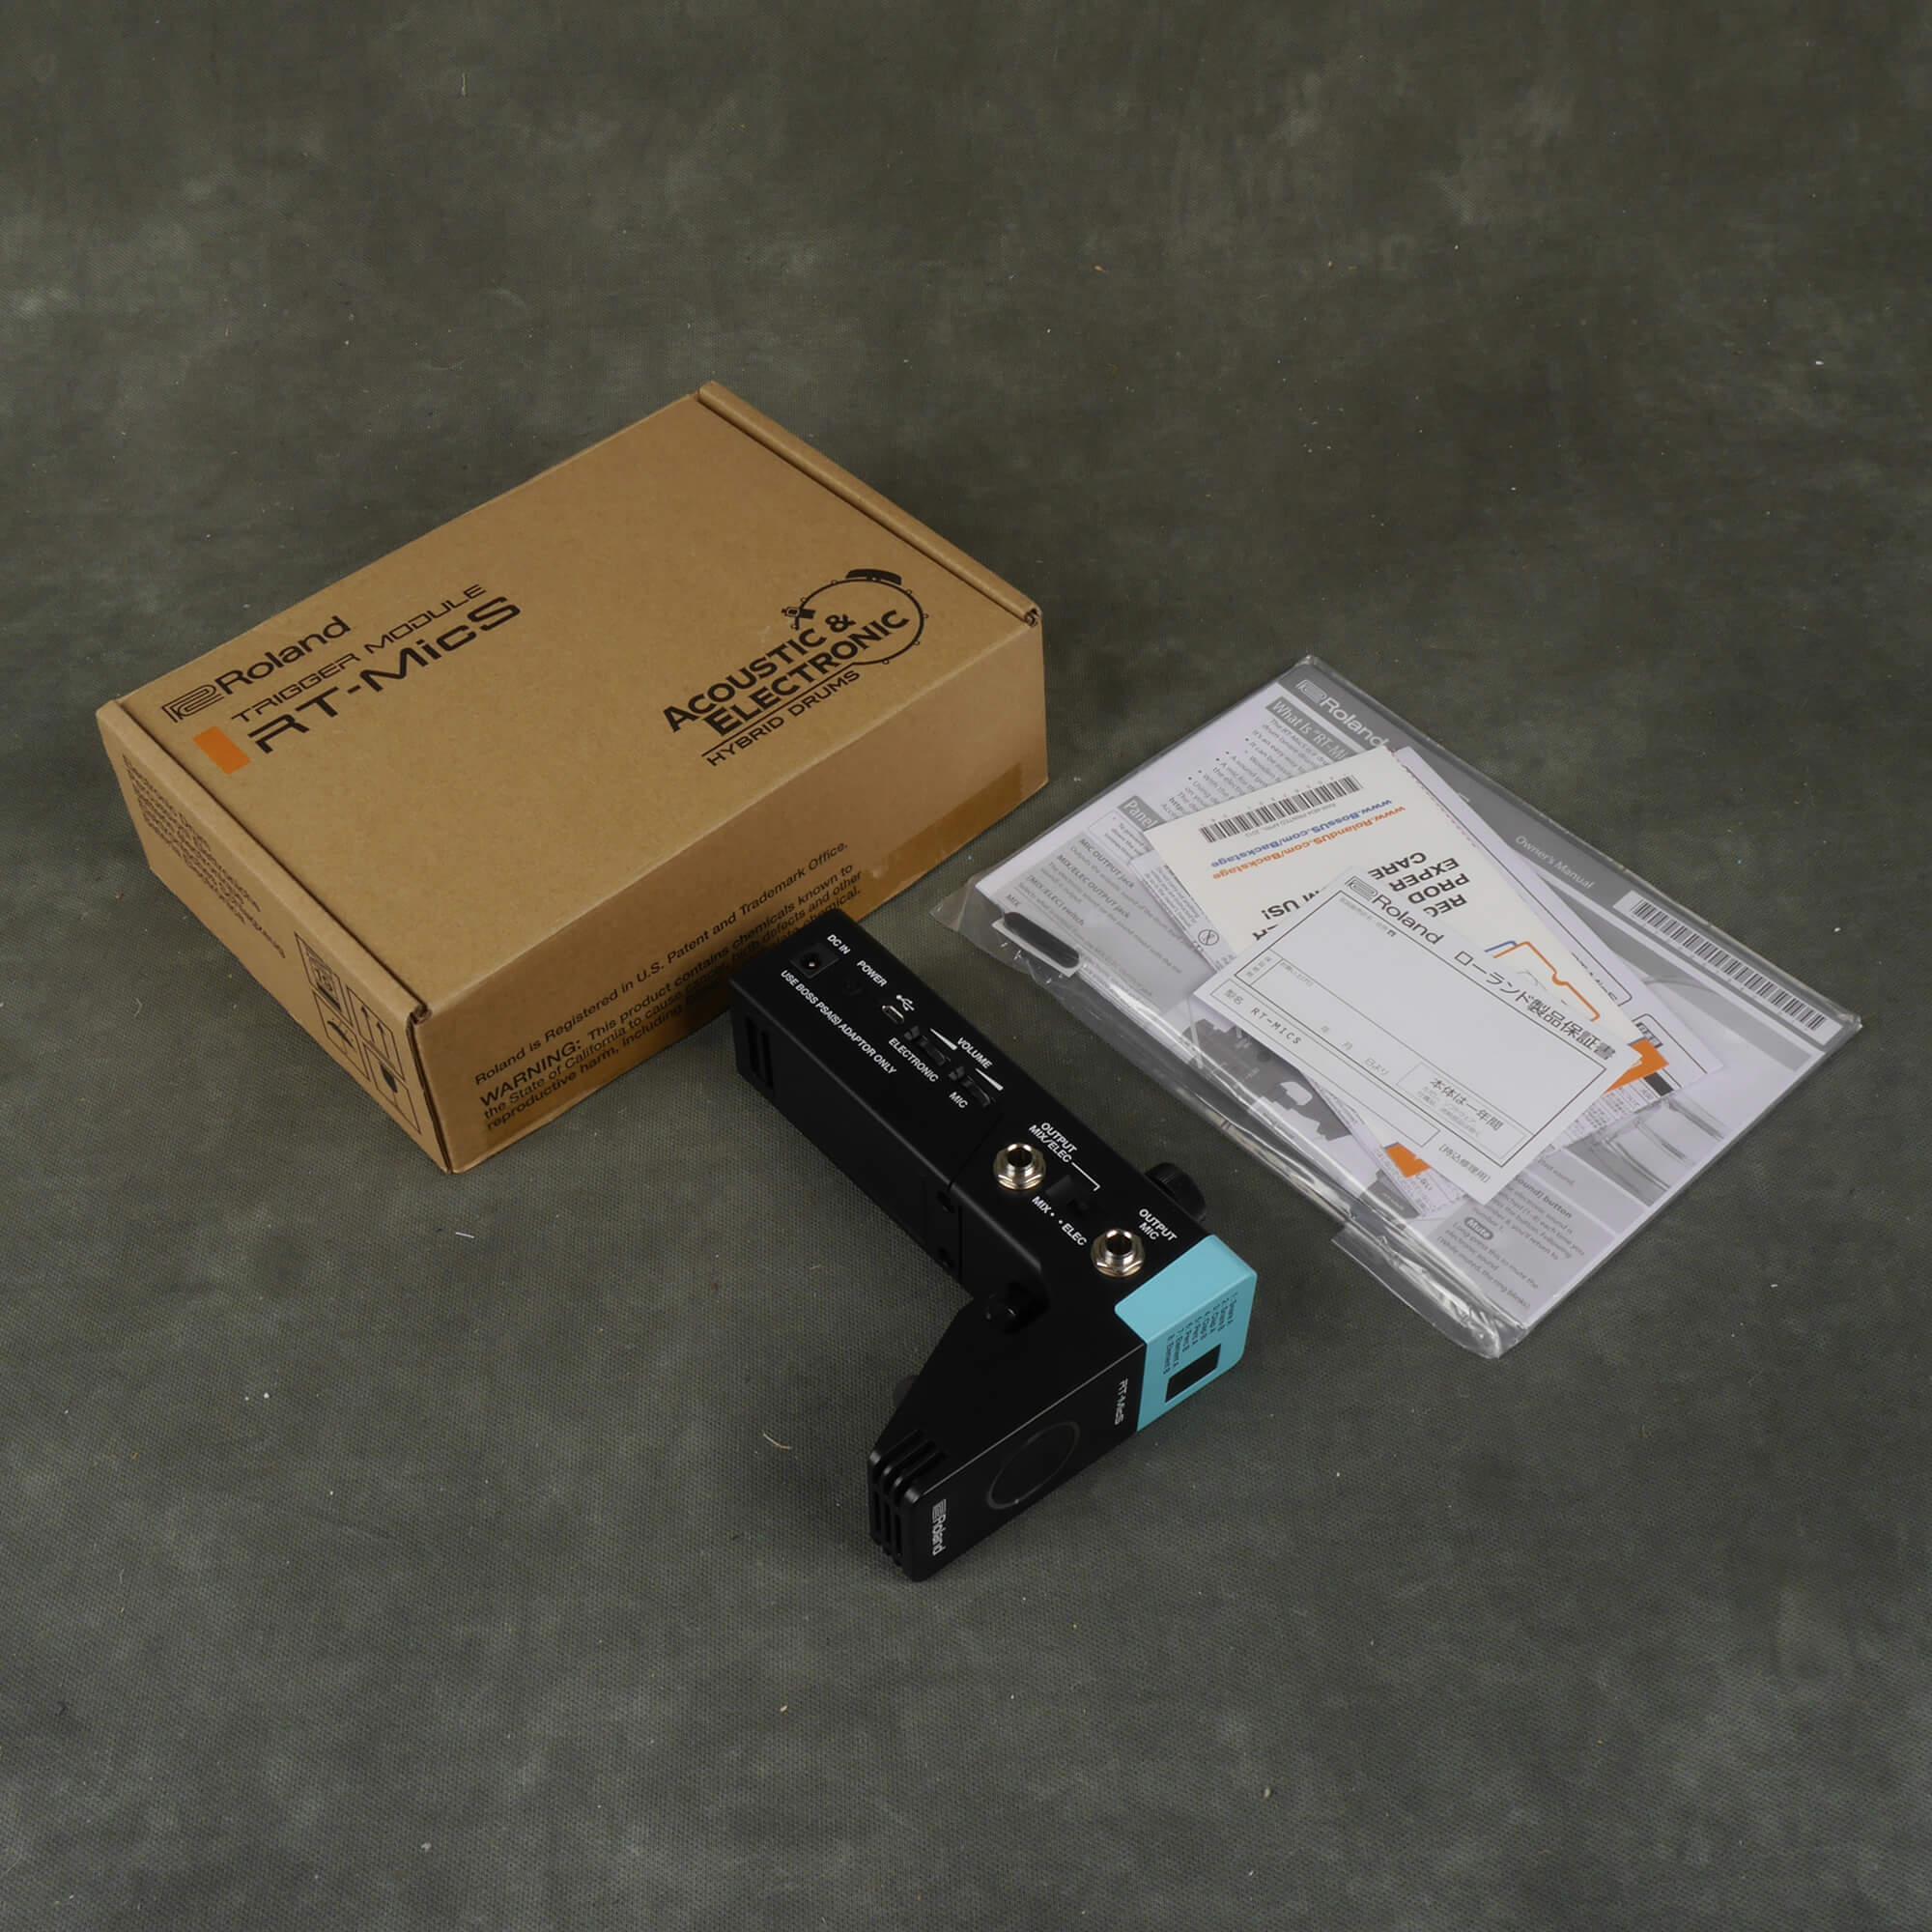 Roland RT-MicS Hybrid Drum Module w/Box - 2nd Hand